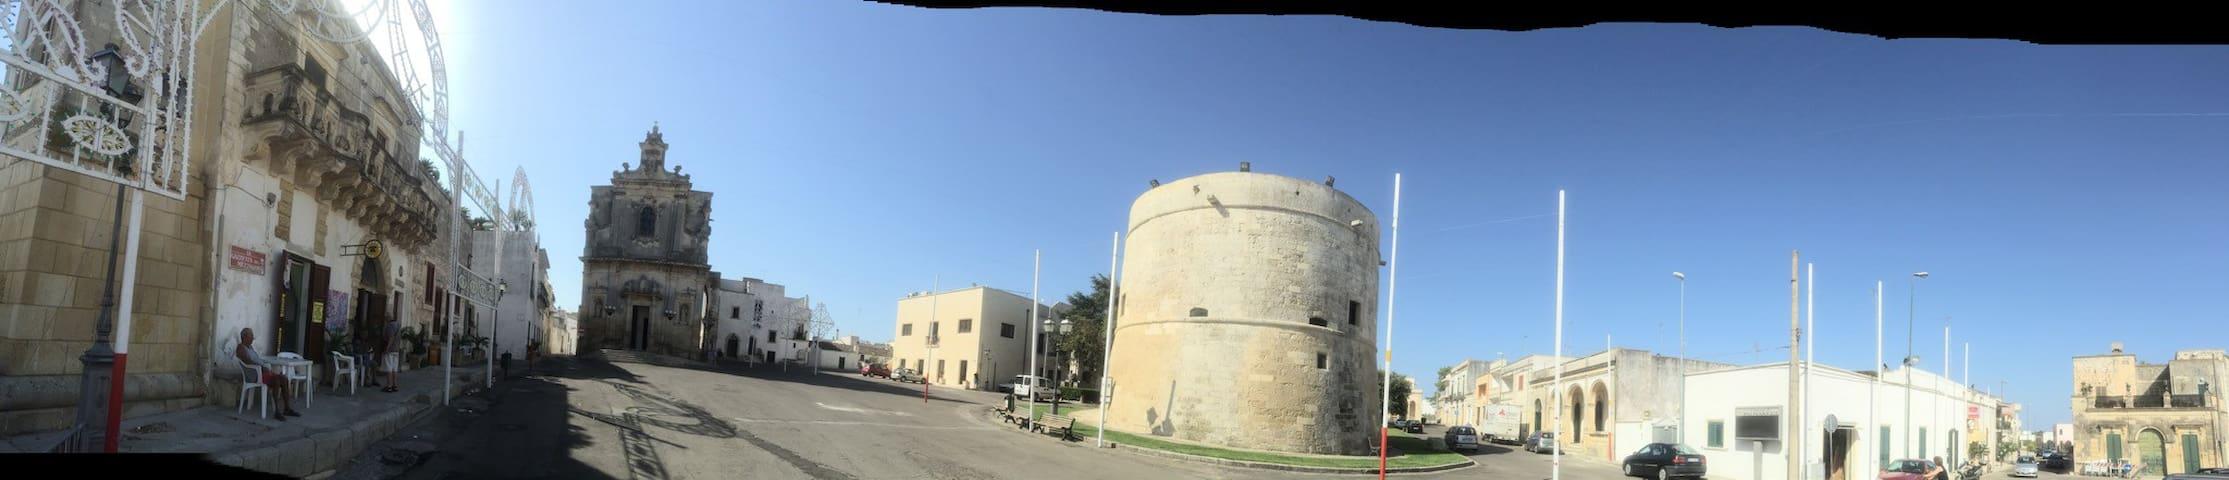 Palmariggi Castle - a nice short walking distance.